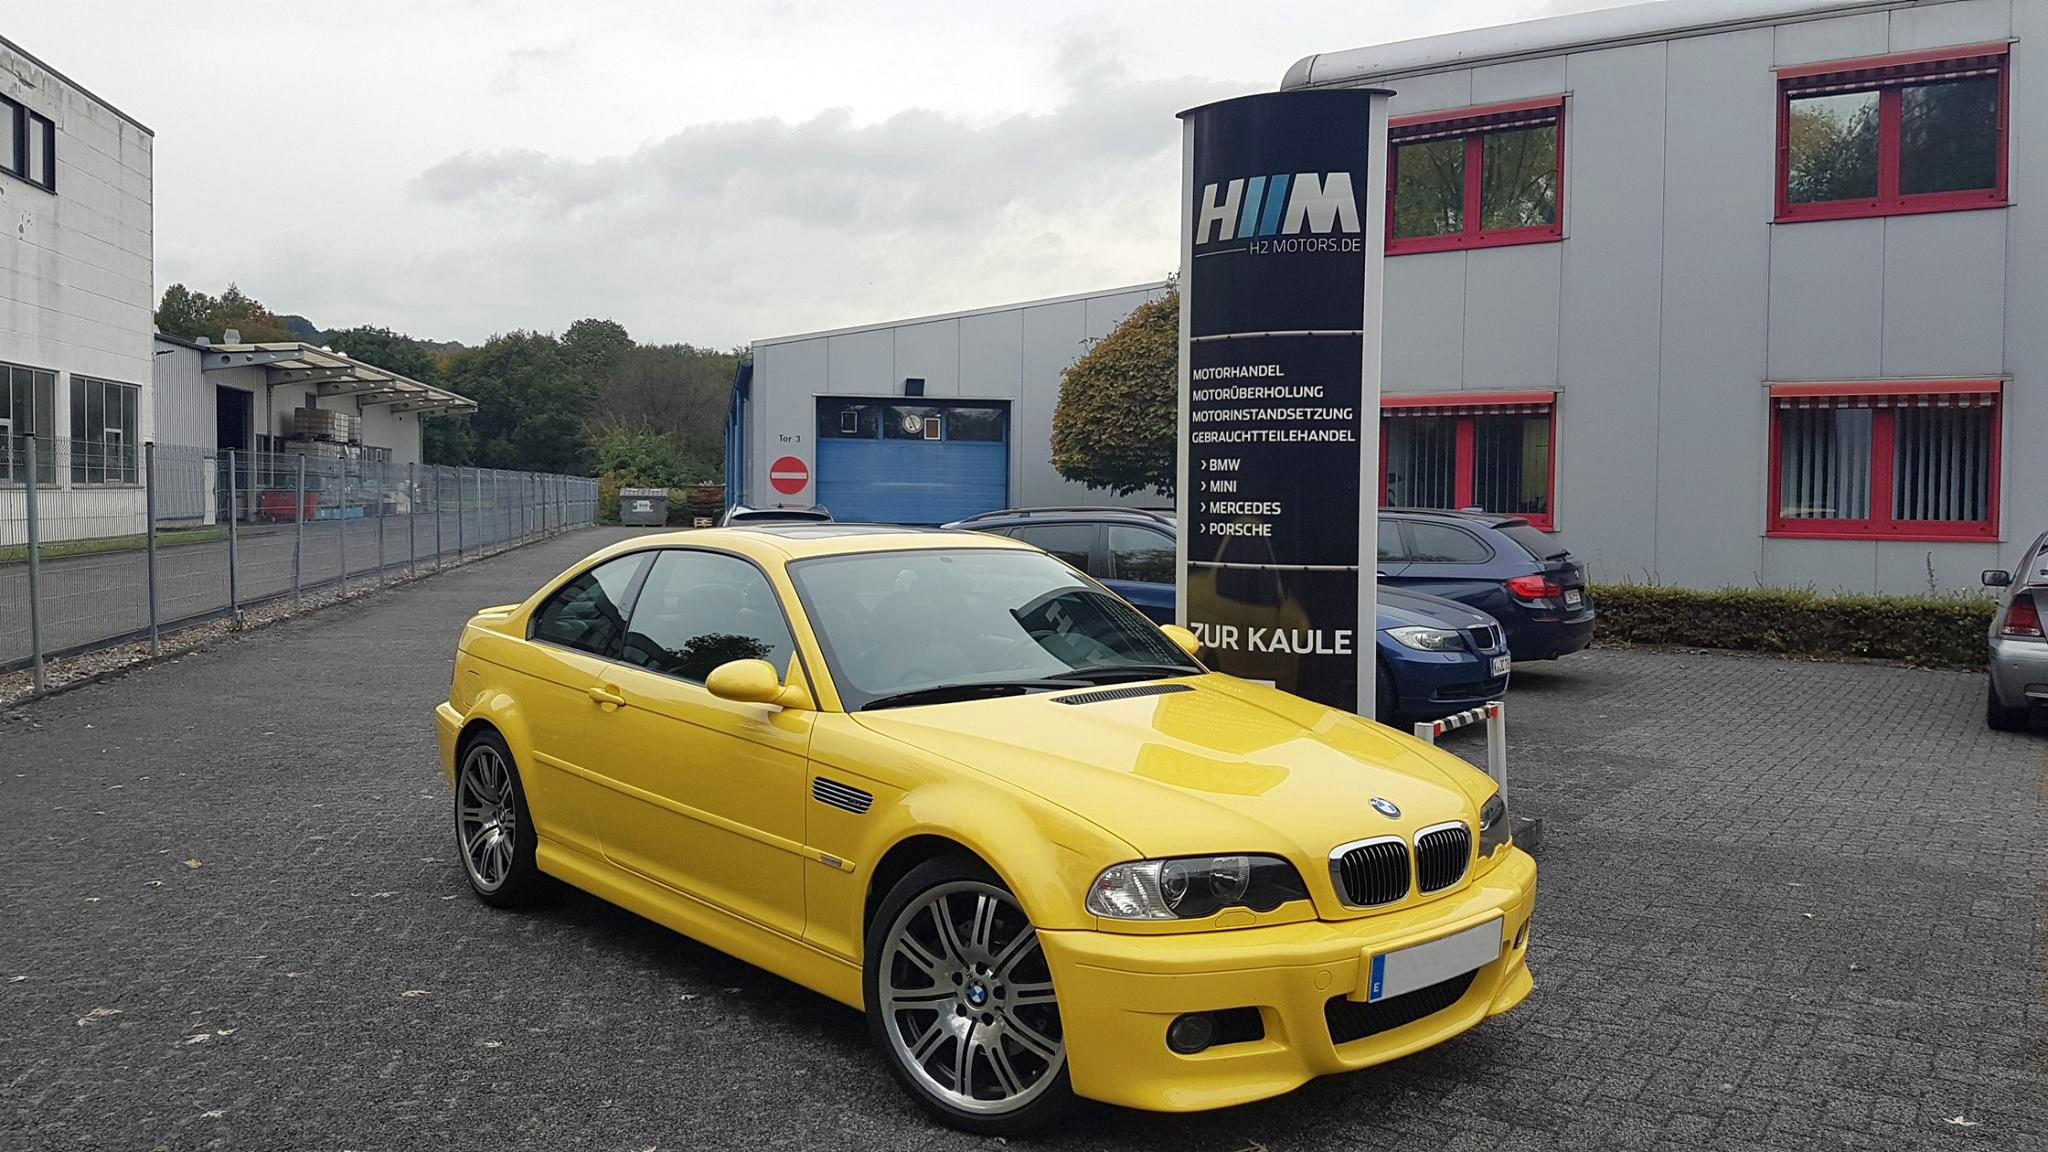 Motorrevision beim BMW E46 M3